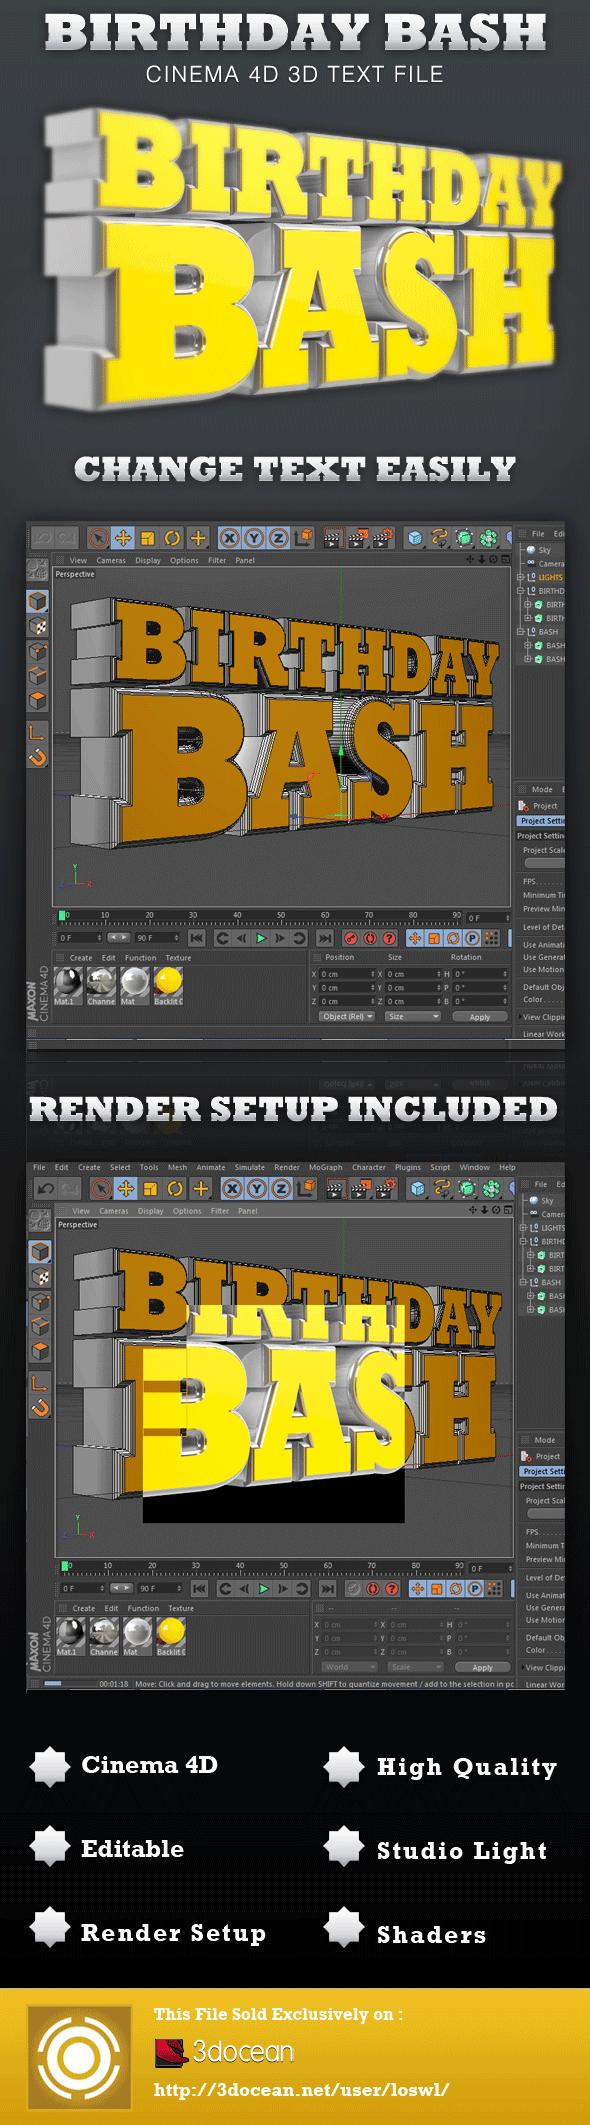 Birthday Bash Cinema 4D 3D Text File - 3DOcean Item for Sale